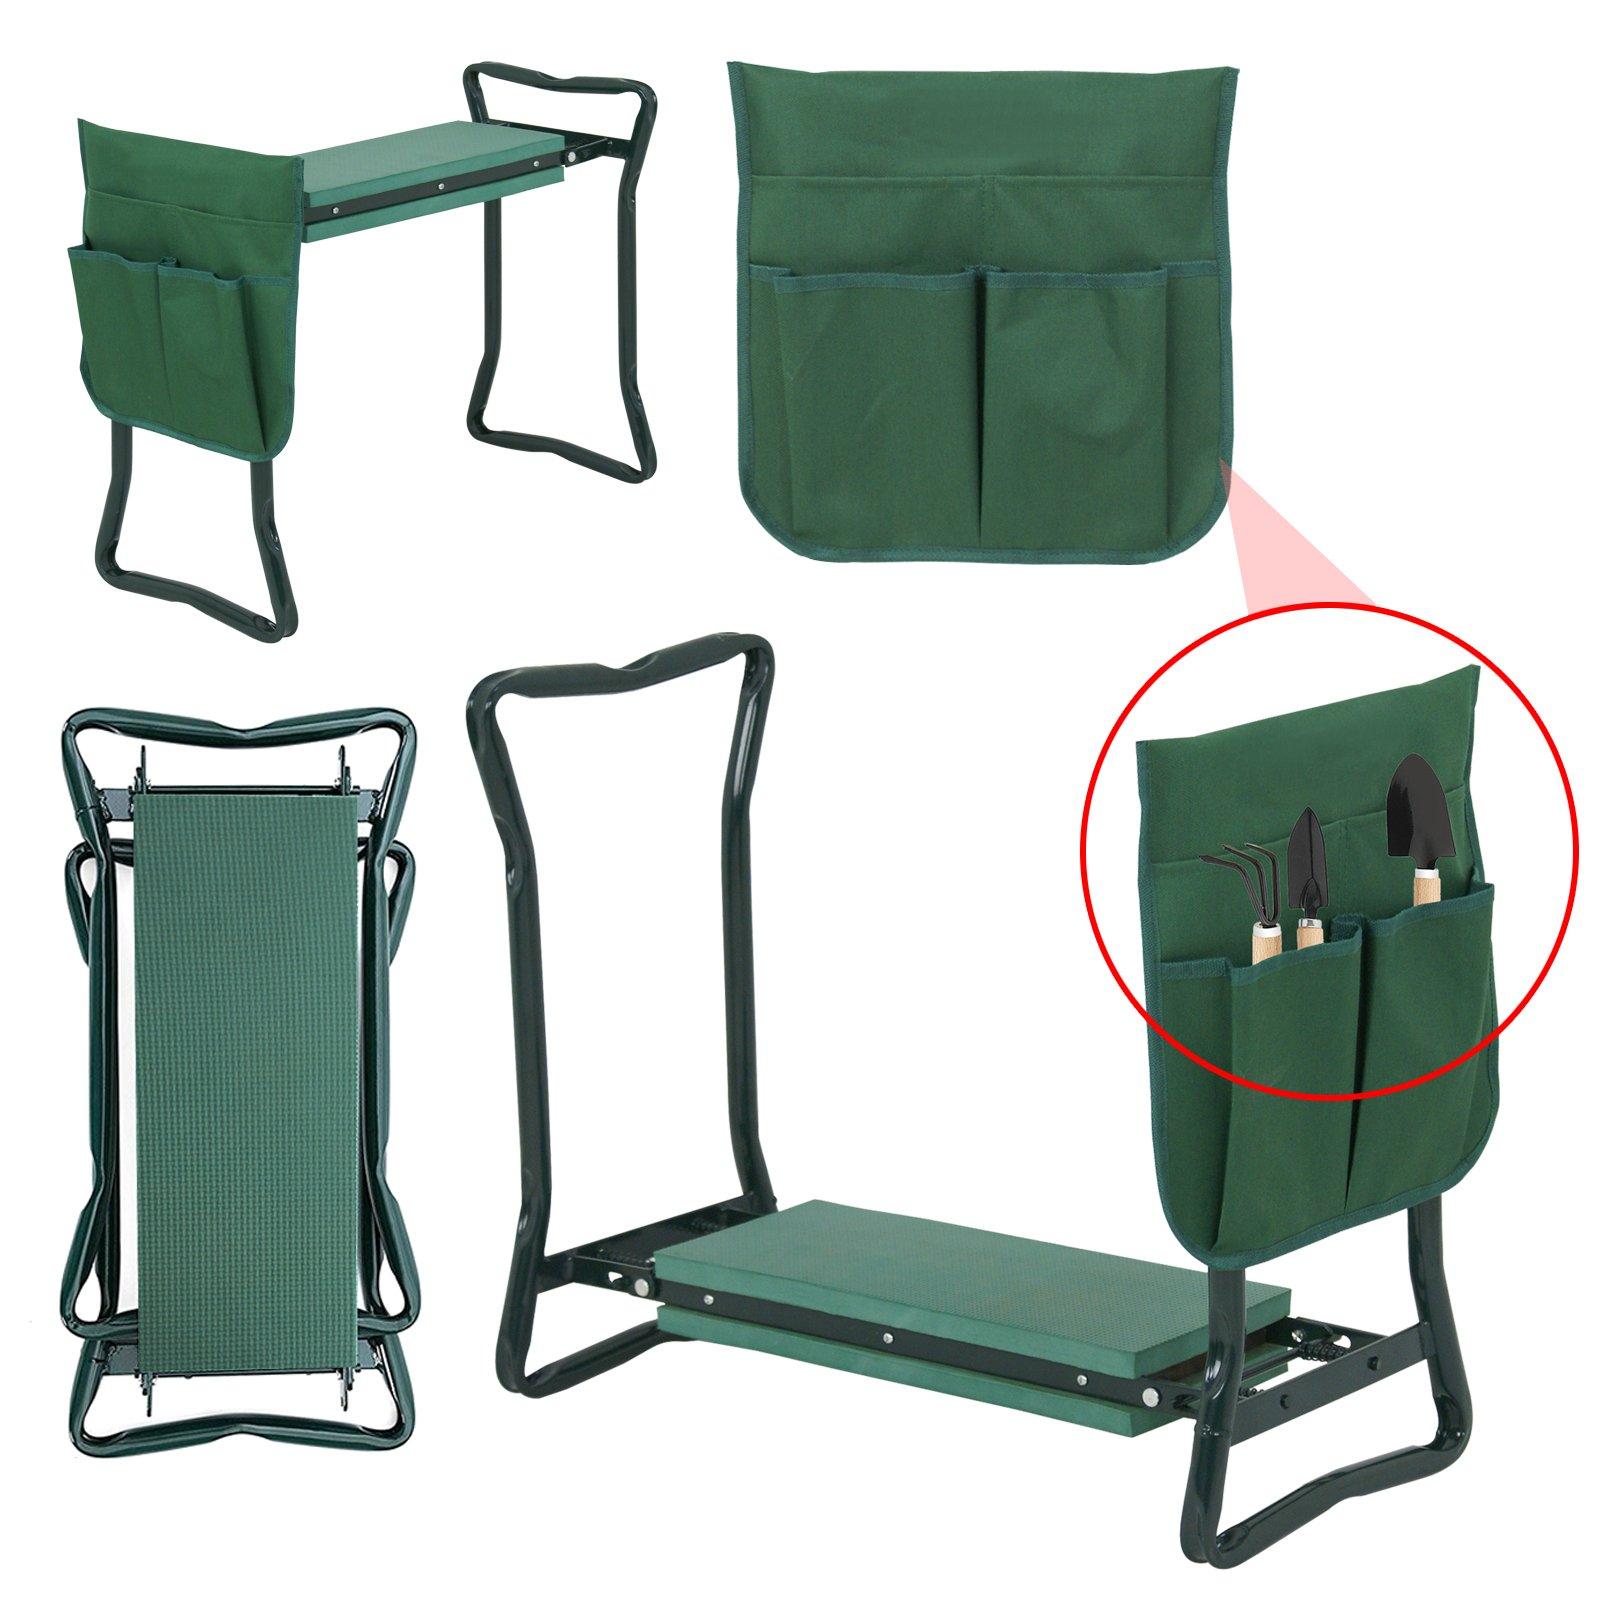 LEMY Garden Kneeler Seat Multiuse Portable Garden Bench Garden Stools Foldable Stool with Tool Bag Pouch EVA Foam Pad (24 3/8'' x 10 7/8'' x 19 1/8'') by LEMY